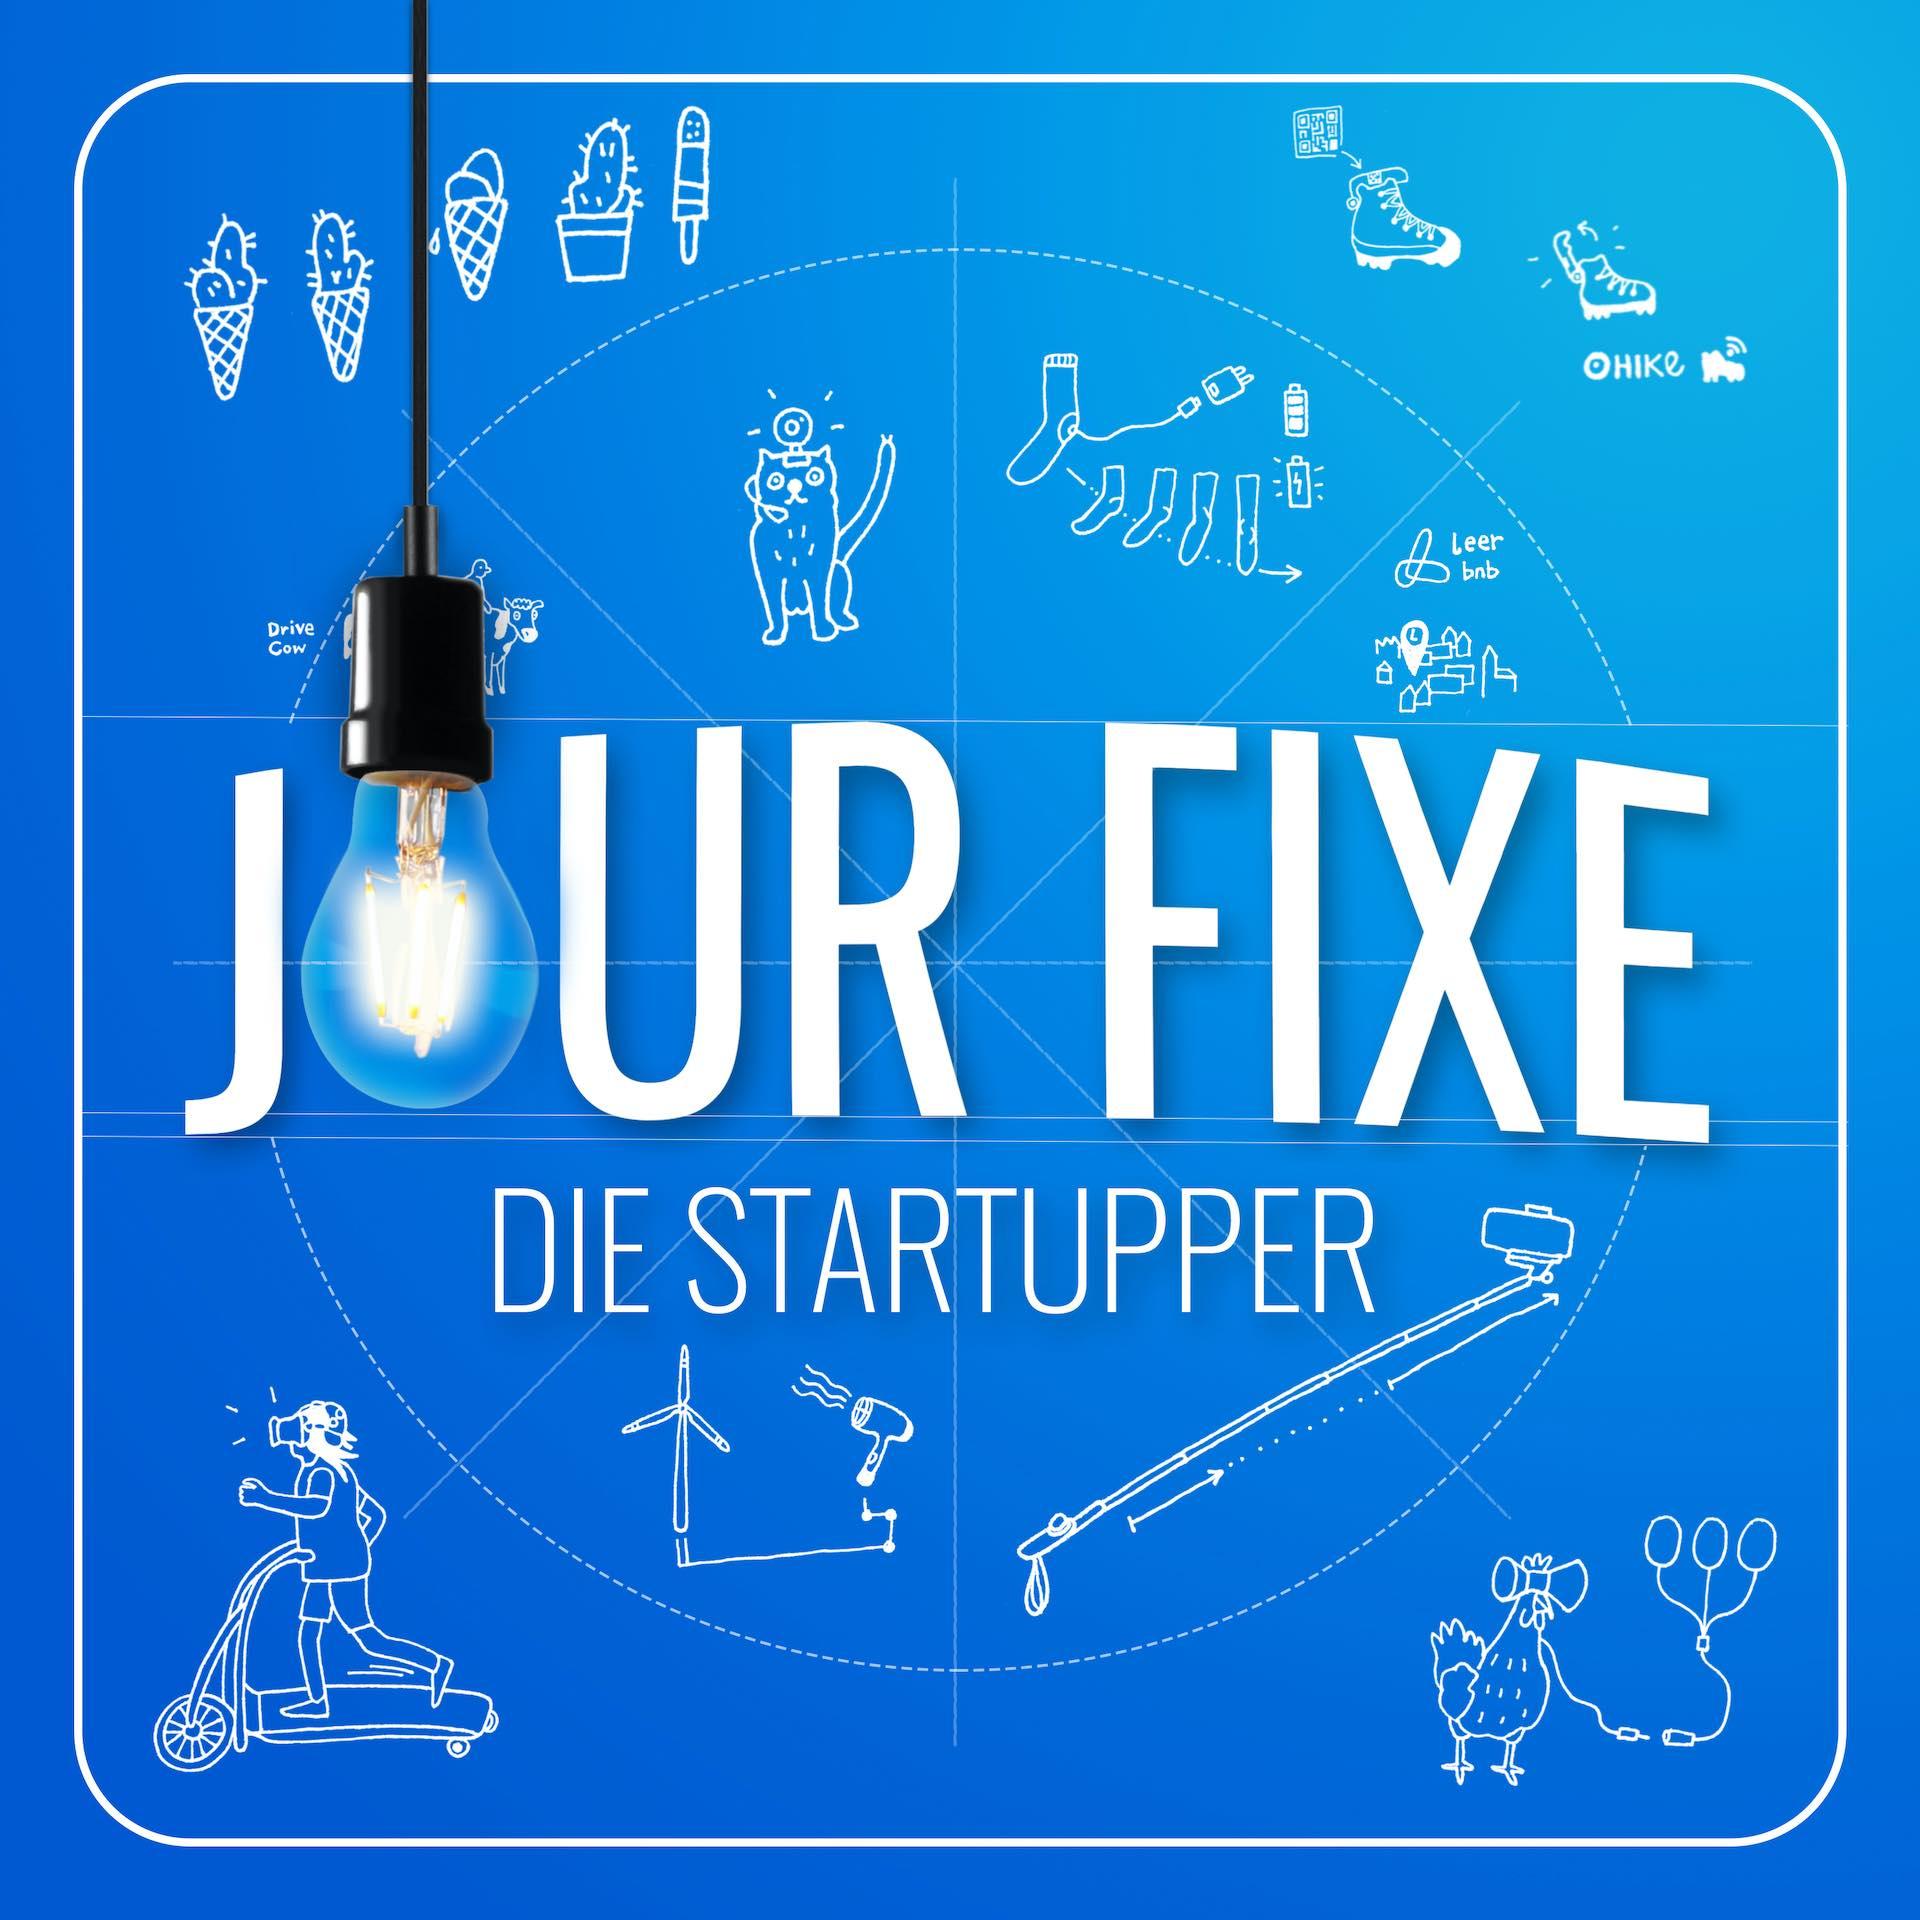 JOUR FIXE – Die Startupper (Audio-Sitcom, 2020)